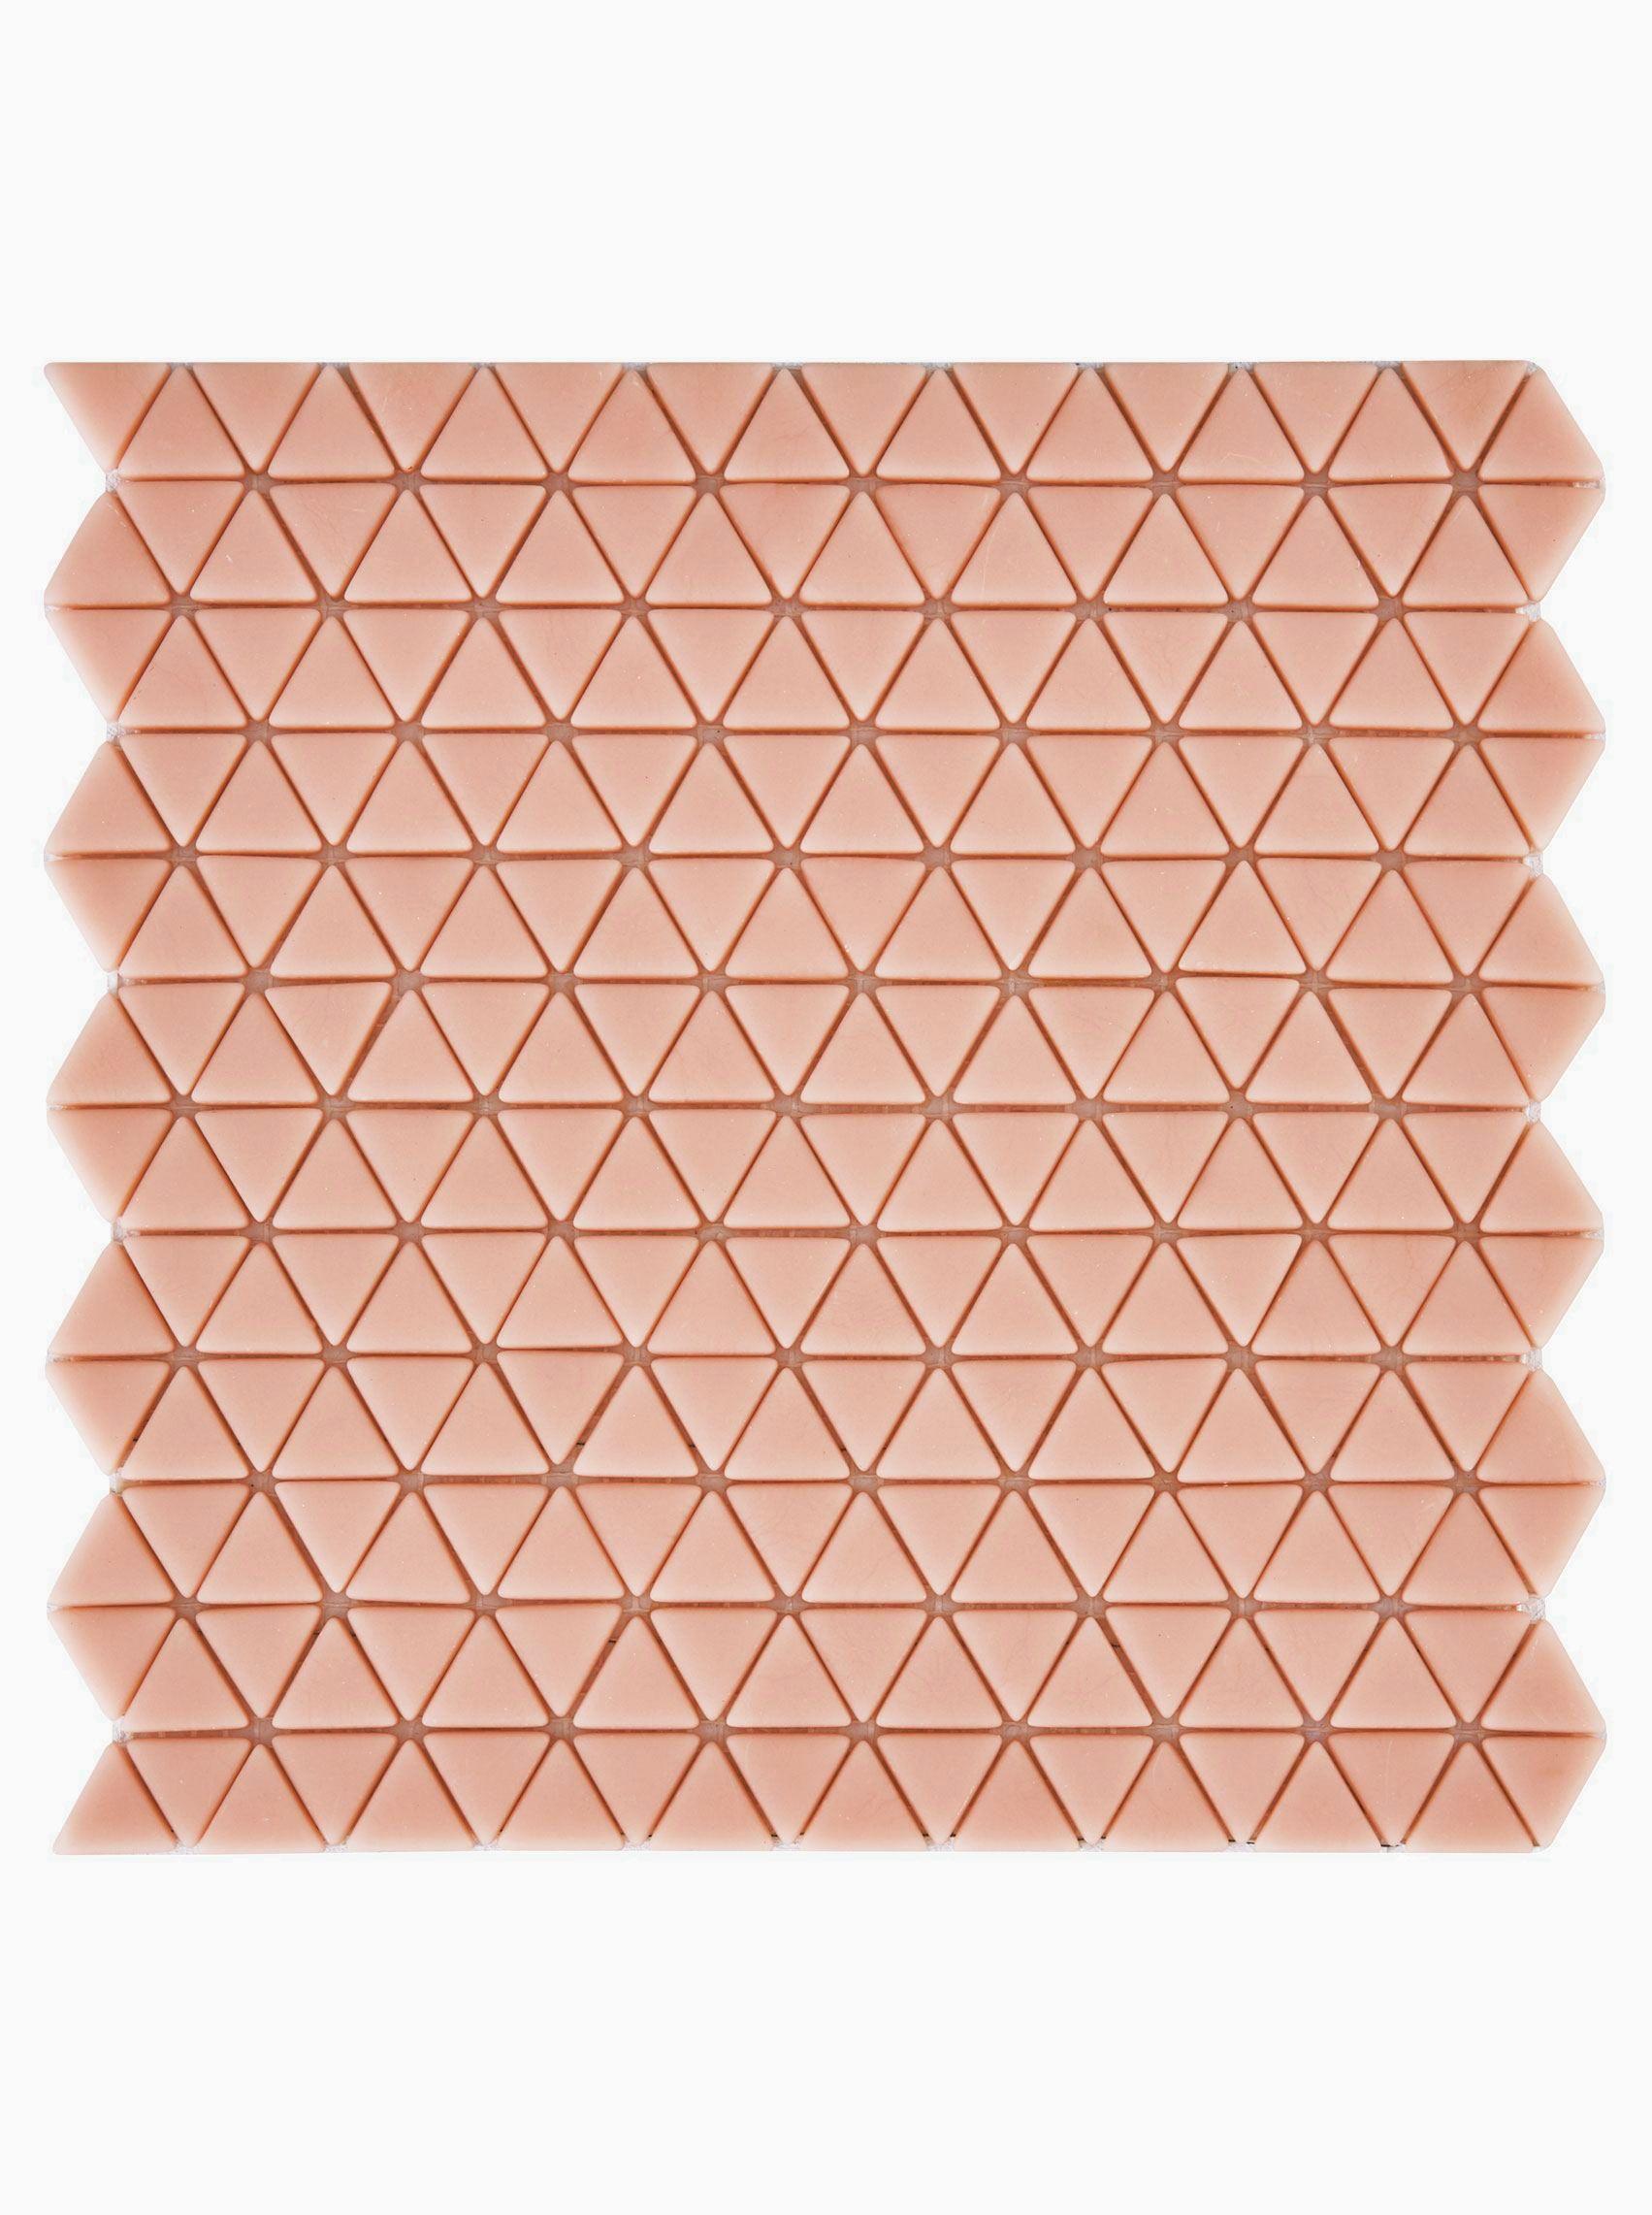 Confiserie Blush Triangle Mosaic